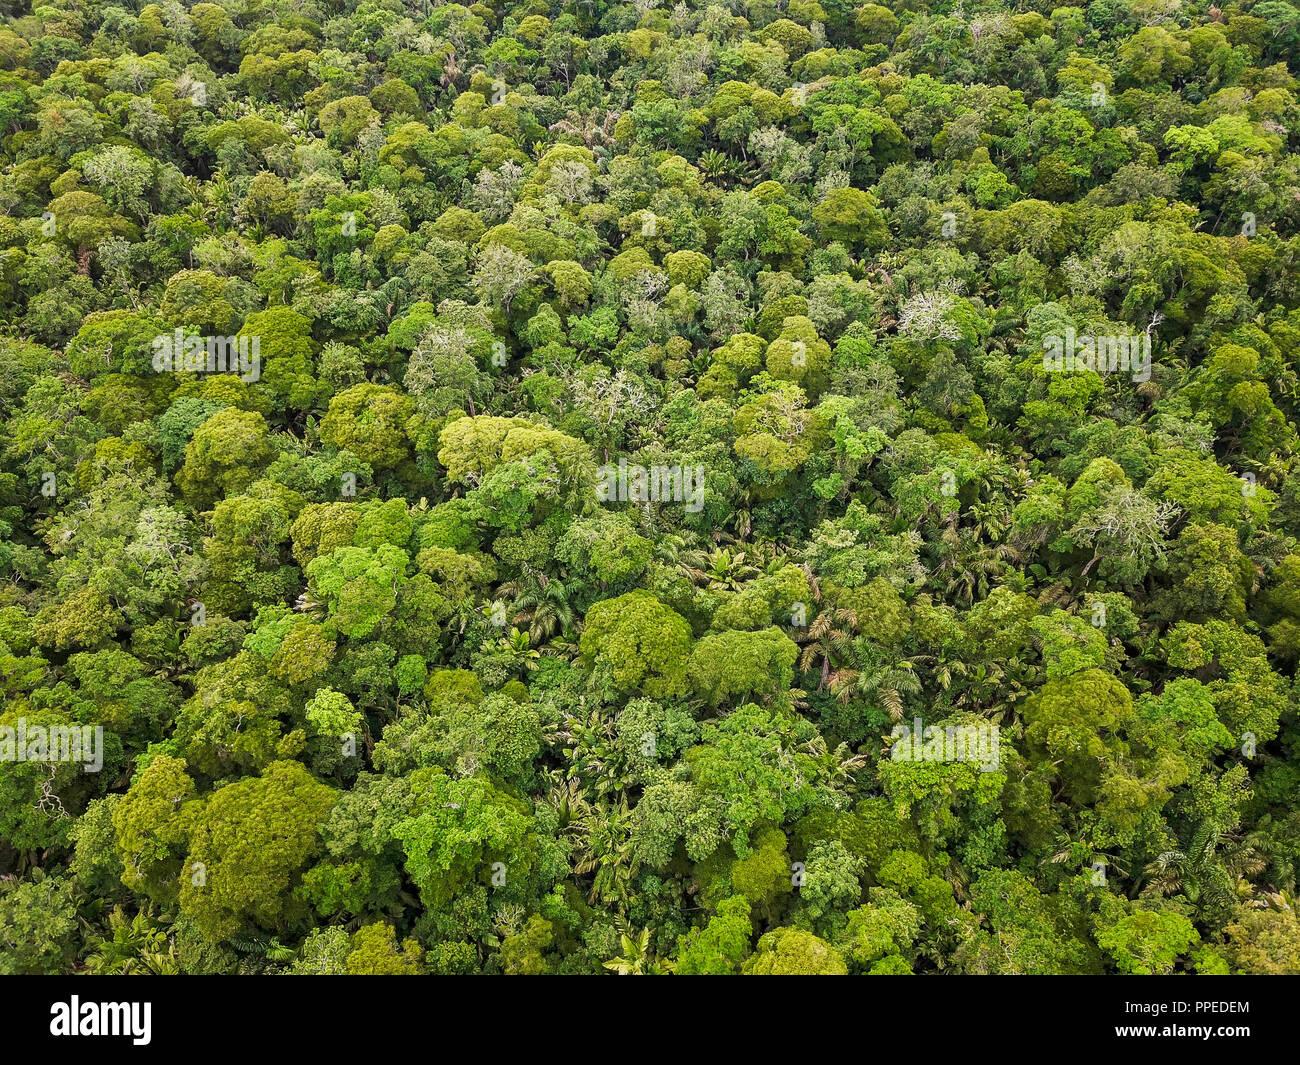 RainForest, Tortuguero National Park, Costa Rica - Stock Image